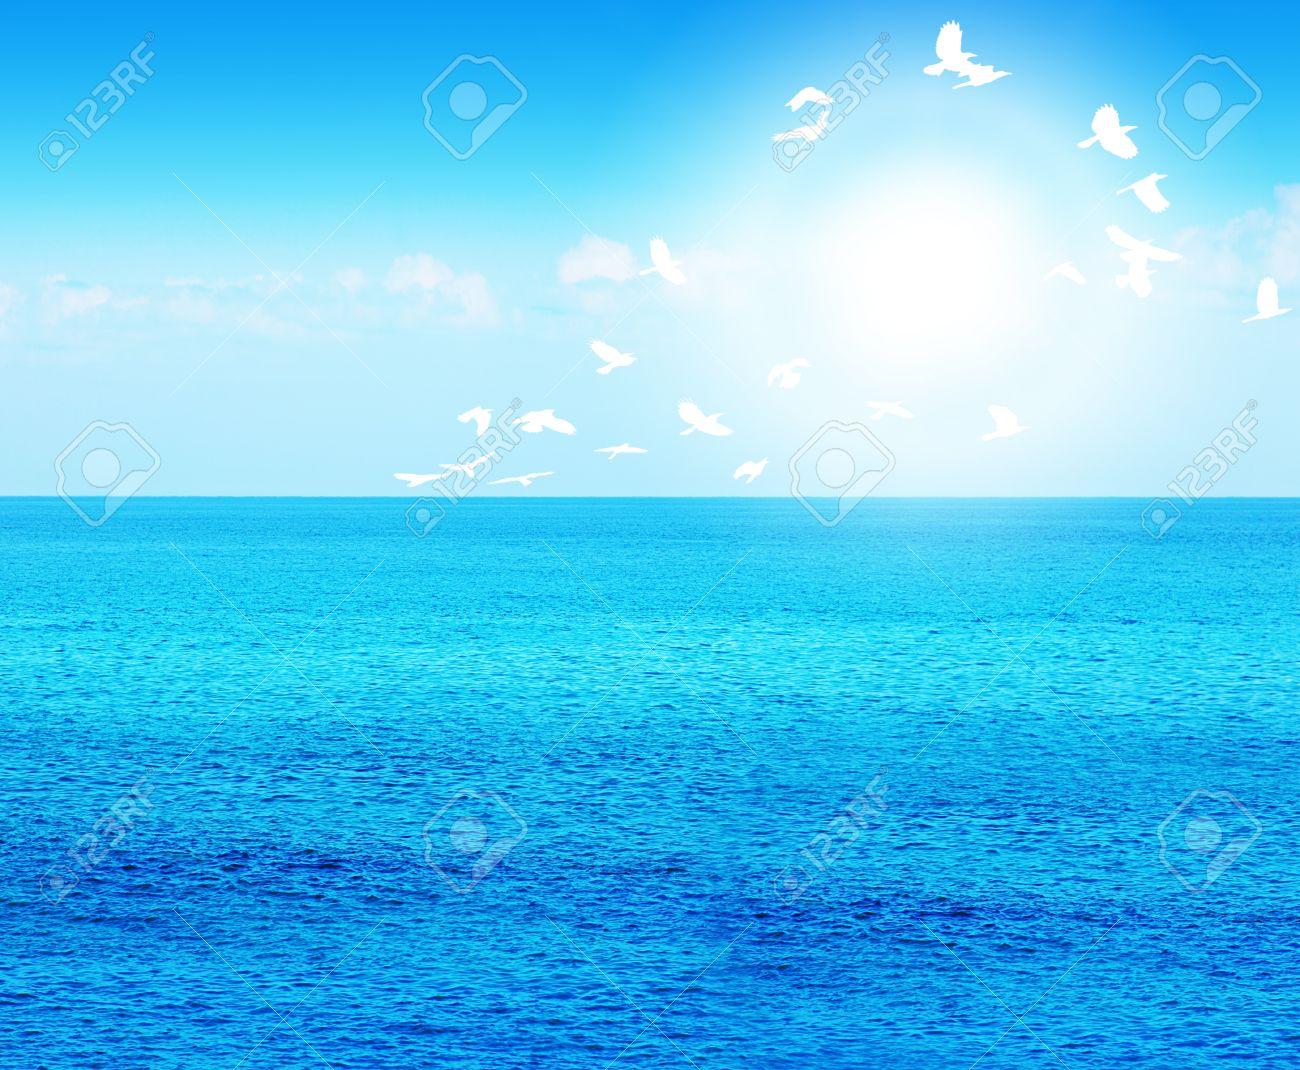 <<<Poemas de colores...>>> - Página 2 9763086-Deep-blue-sea-background-with-birds-beautiful-water-of-nature--Stock-Photo